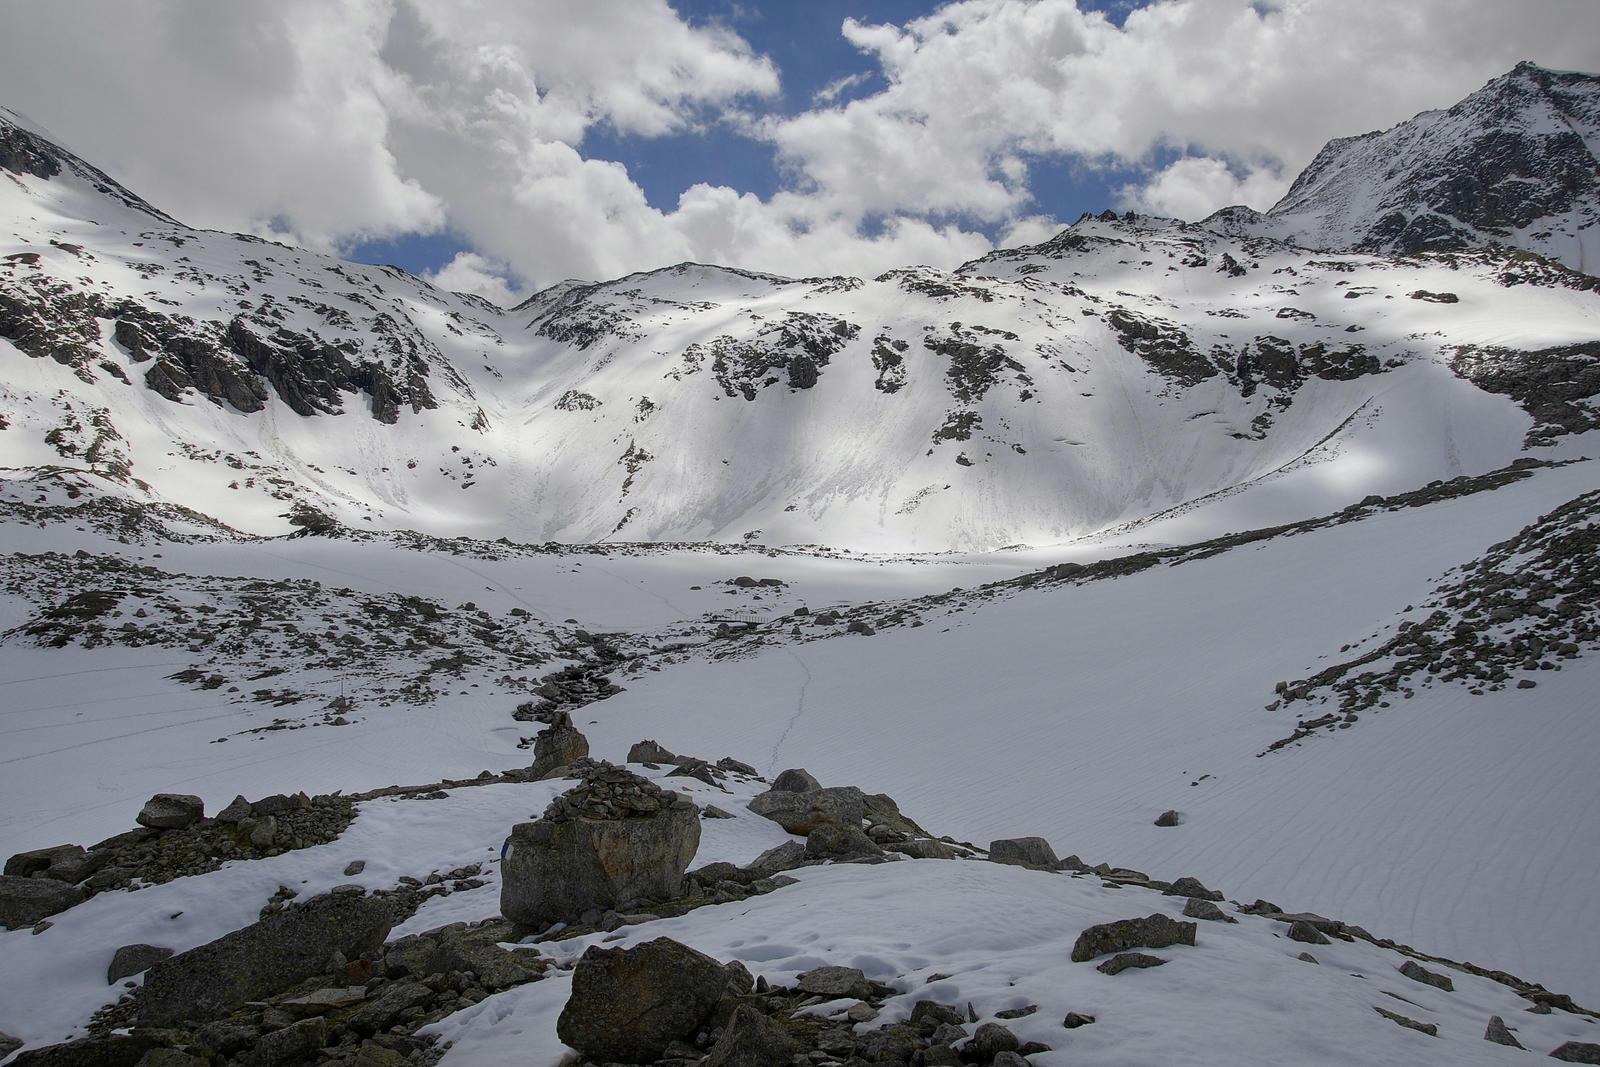 Snowy Mountains Background by Burtn